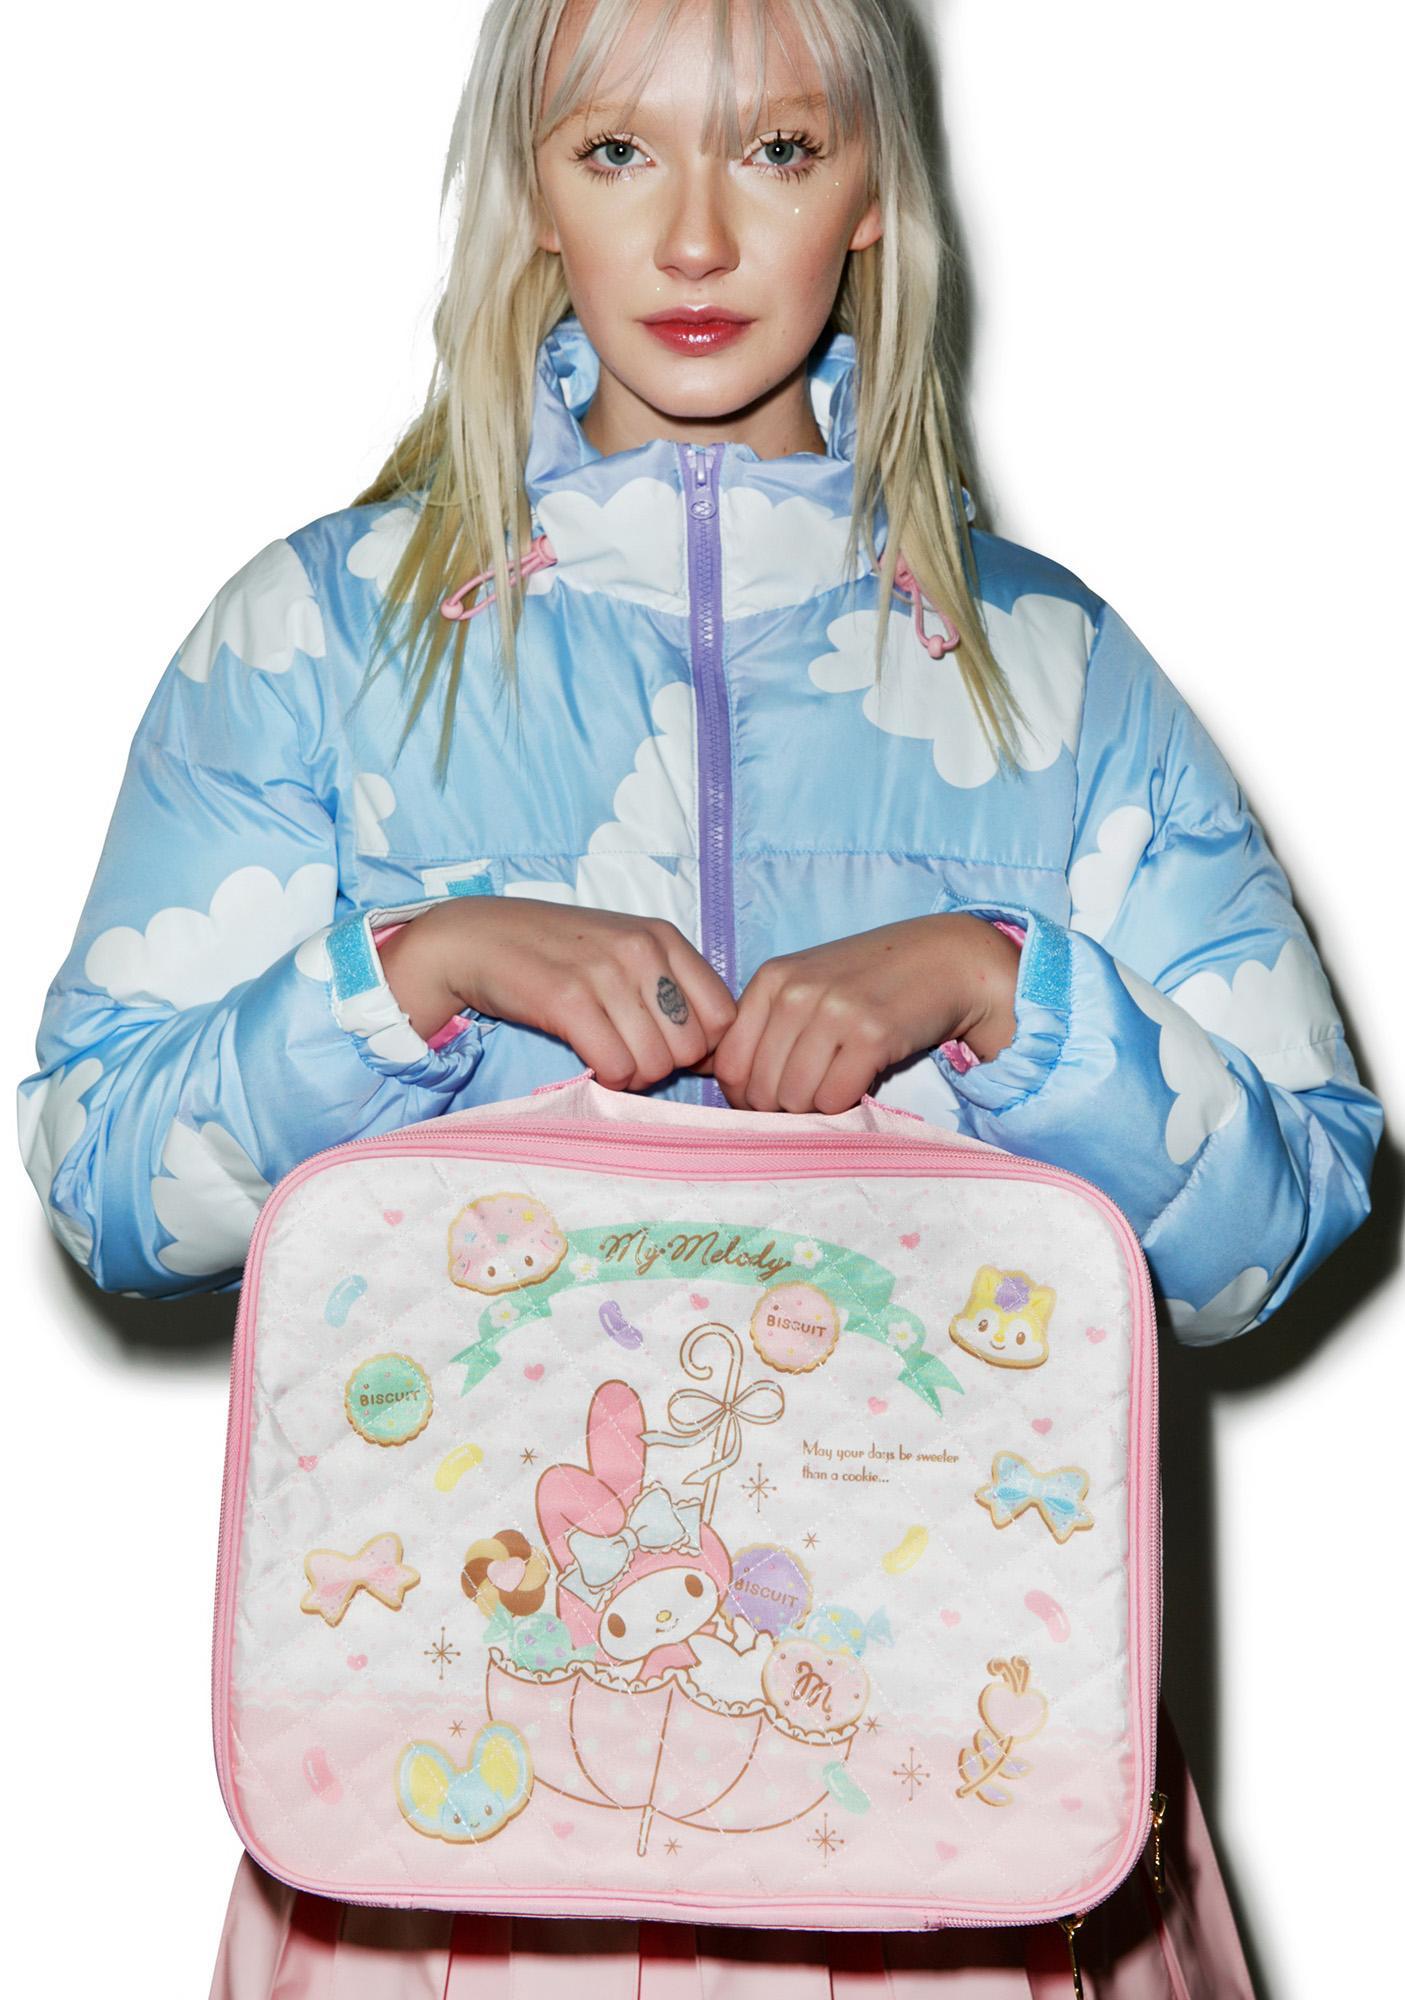 Sanrio My Melody Cookie Mini Suitcase